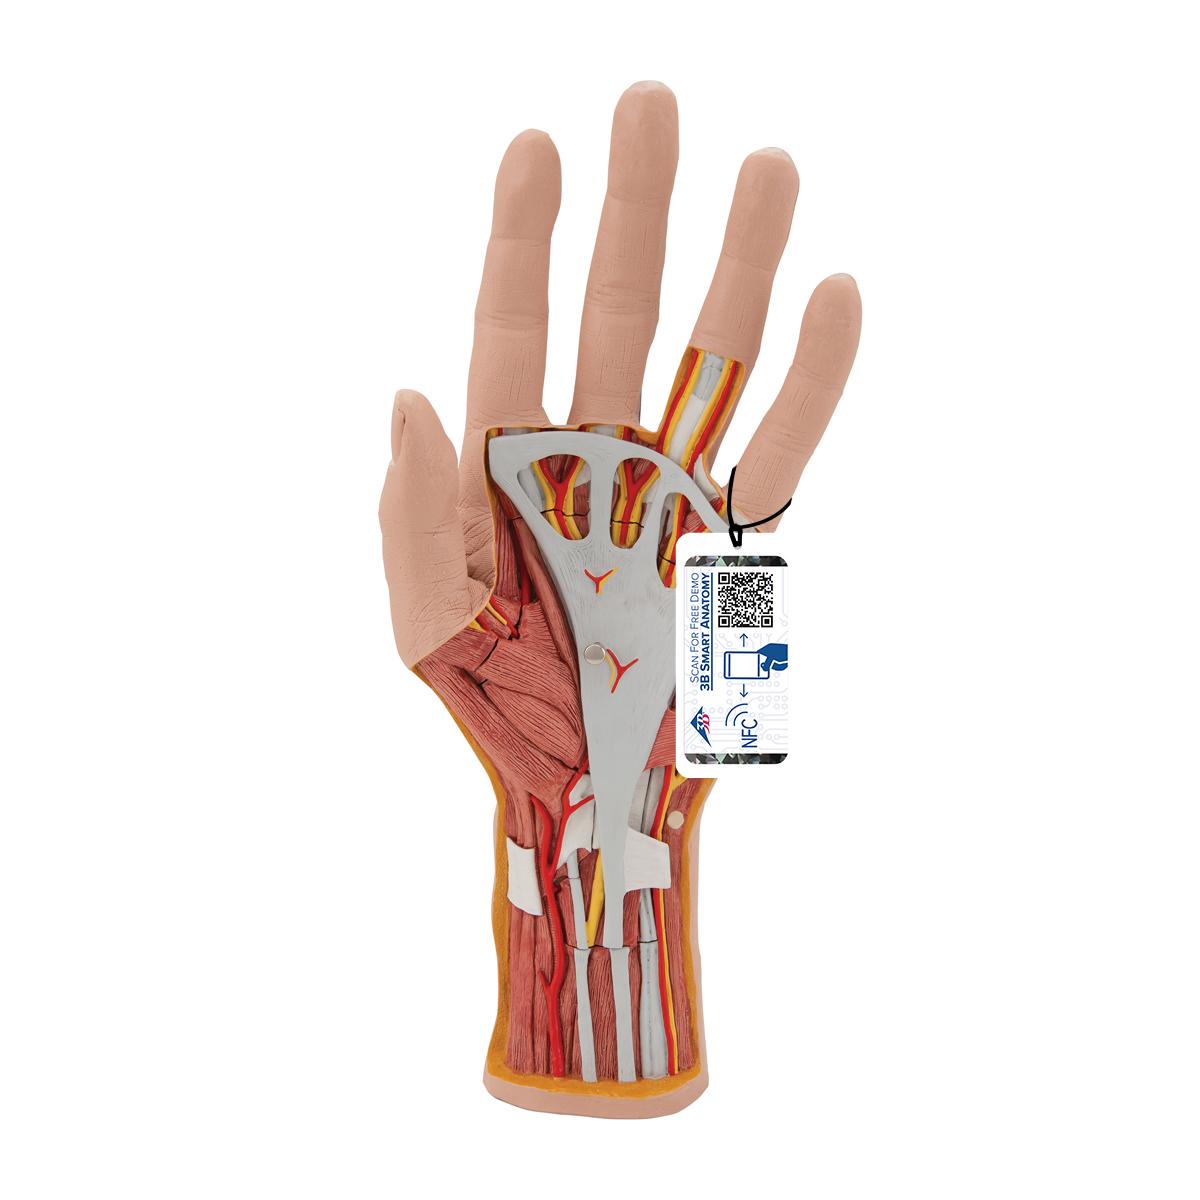 Internal hand structure model 3 part 1000349 3b scientific internal hand structure model 3 part ccuart Choice Image